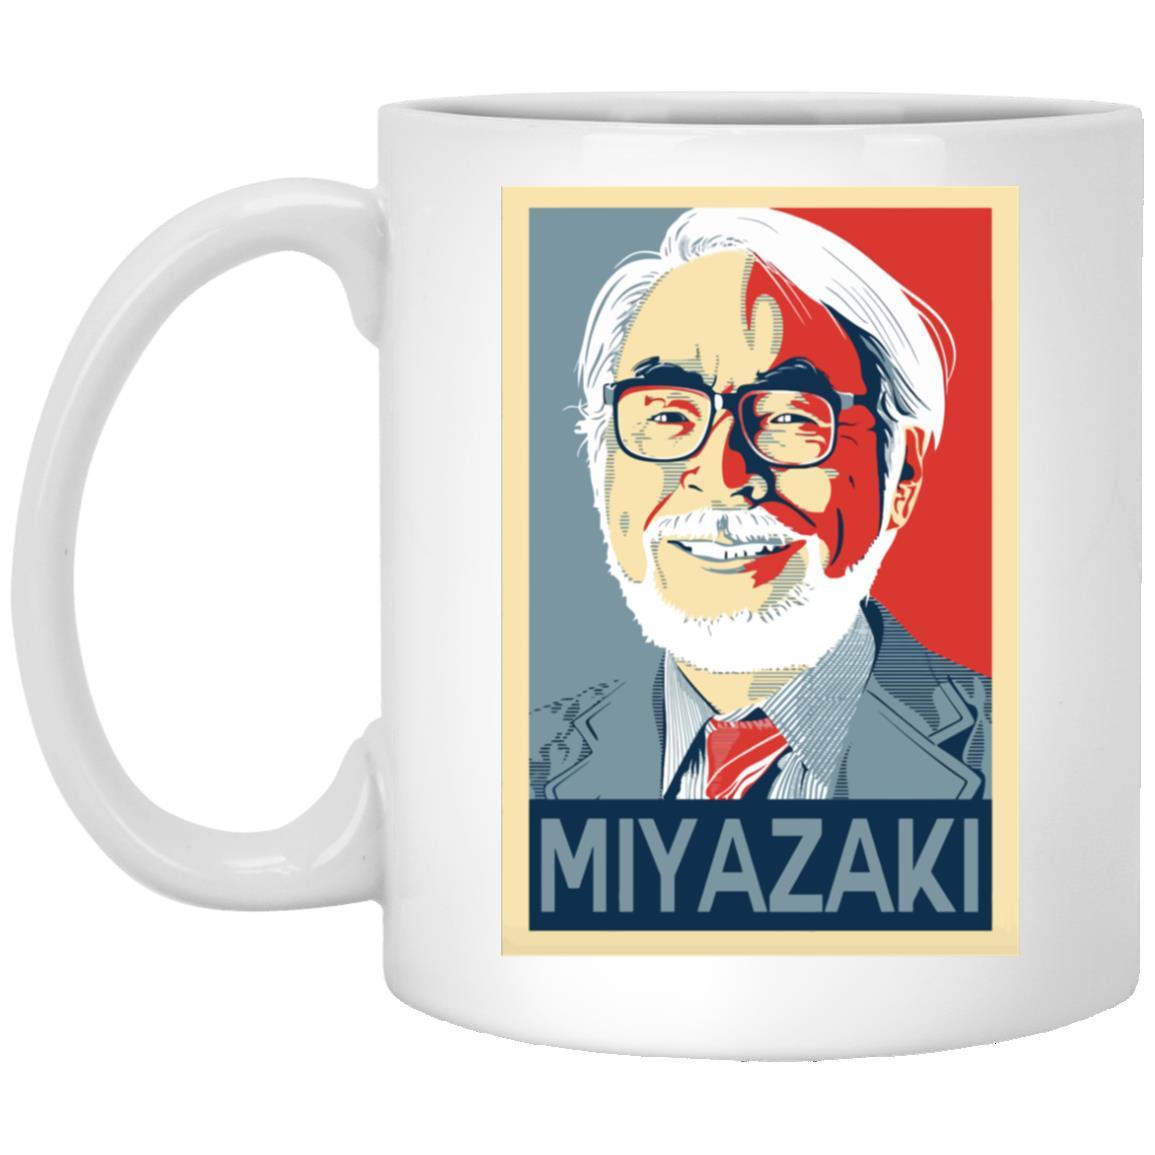 Hayao Miyazaki Studio Ghibli Mug